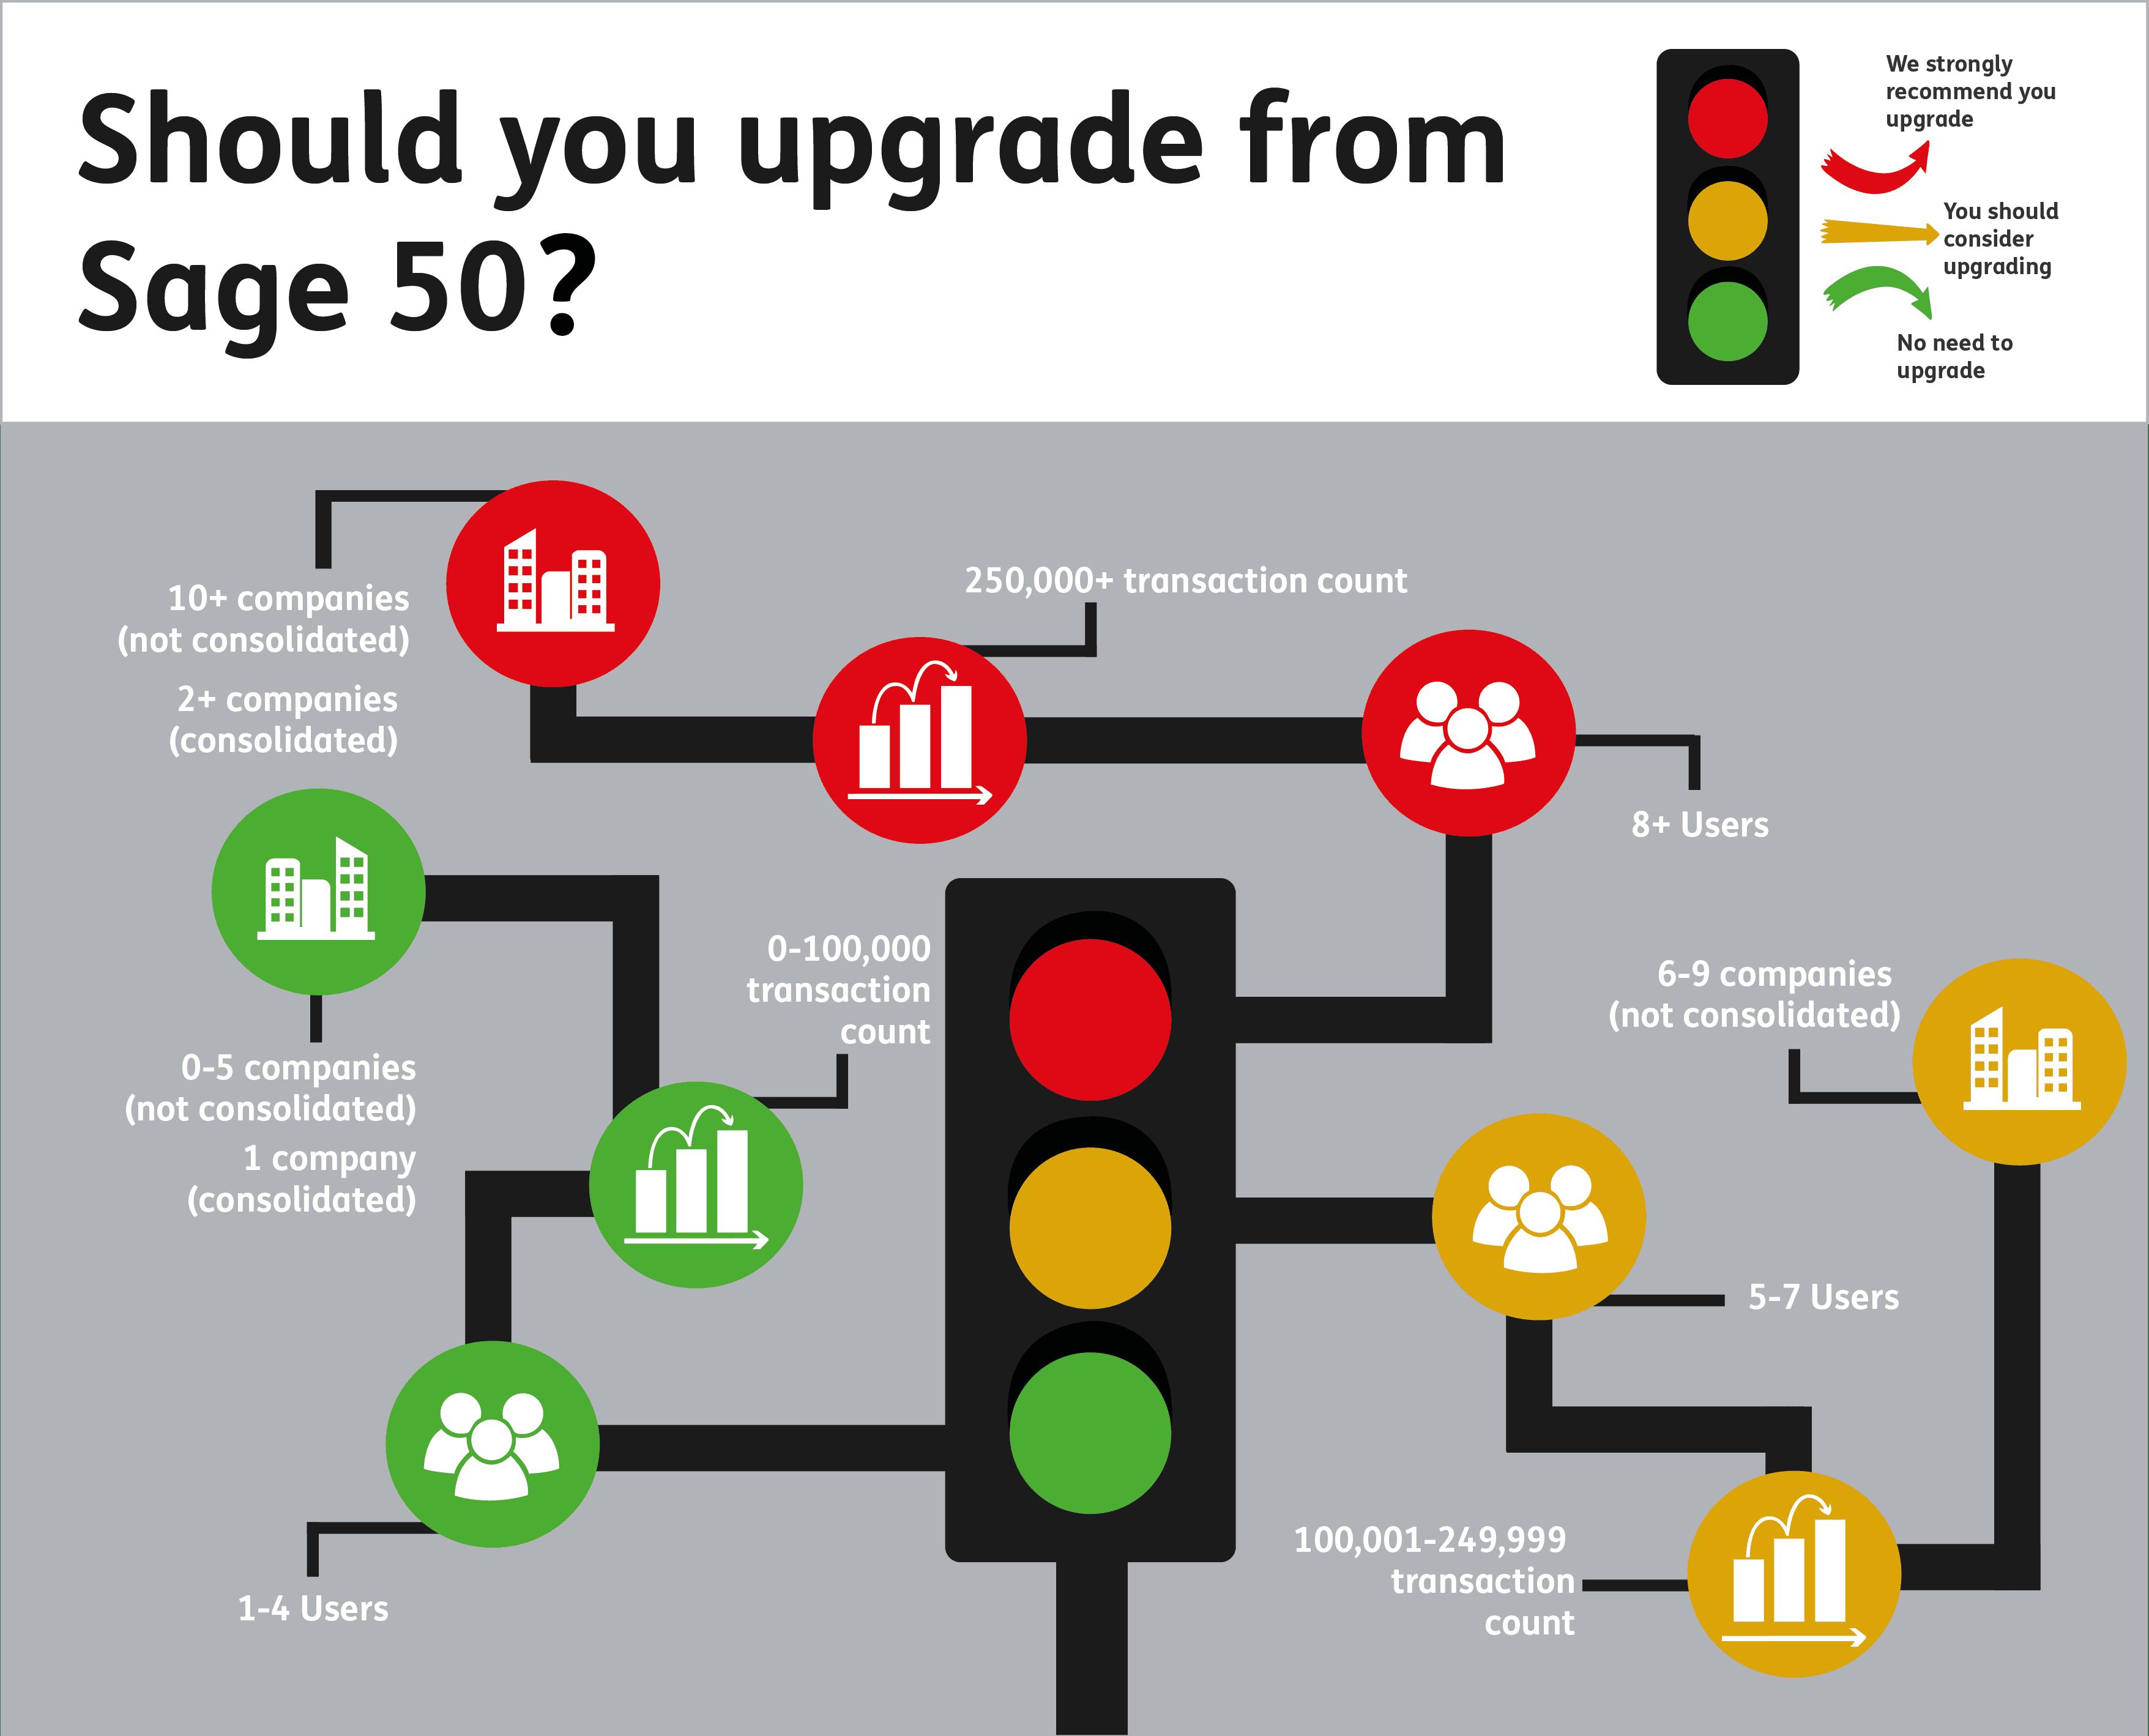 Upgrade Sage 50: Is your Sage 50 system due an upgrade? - Sage UK